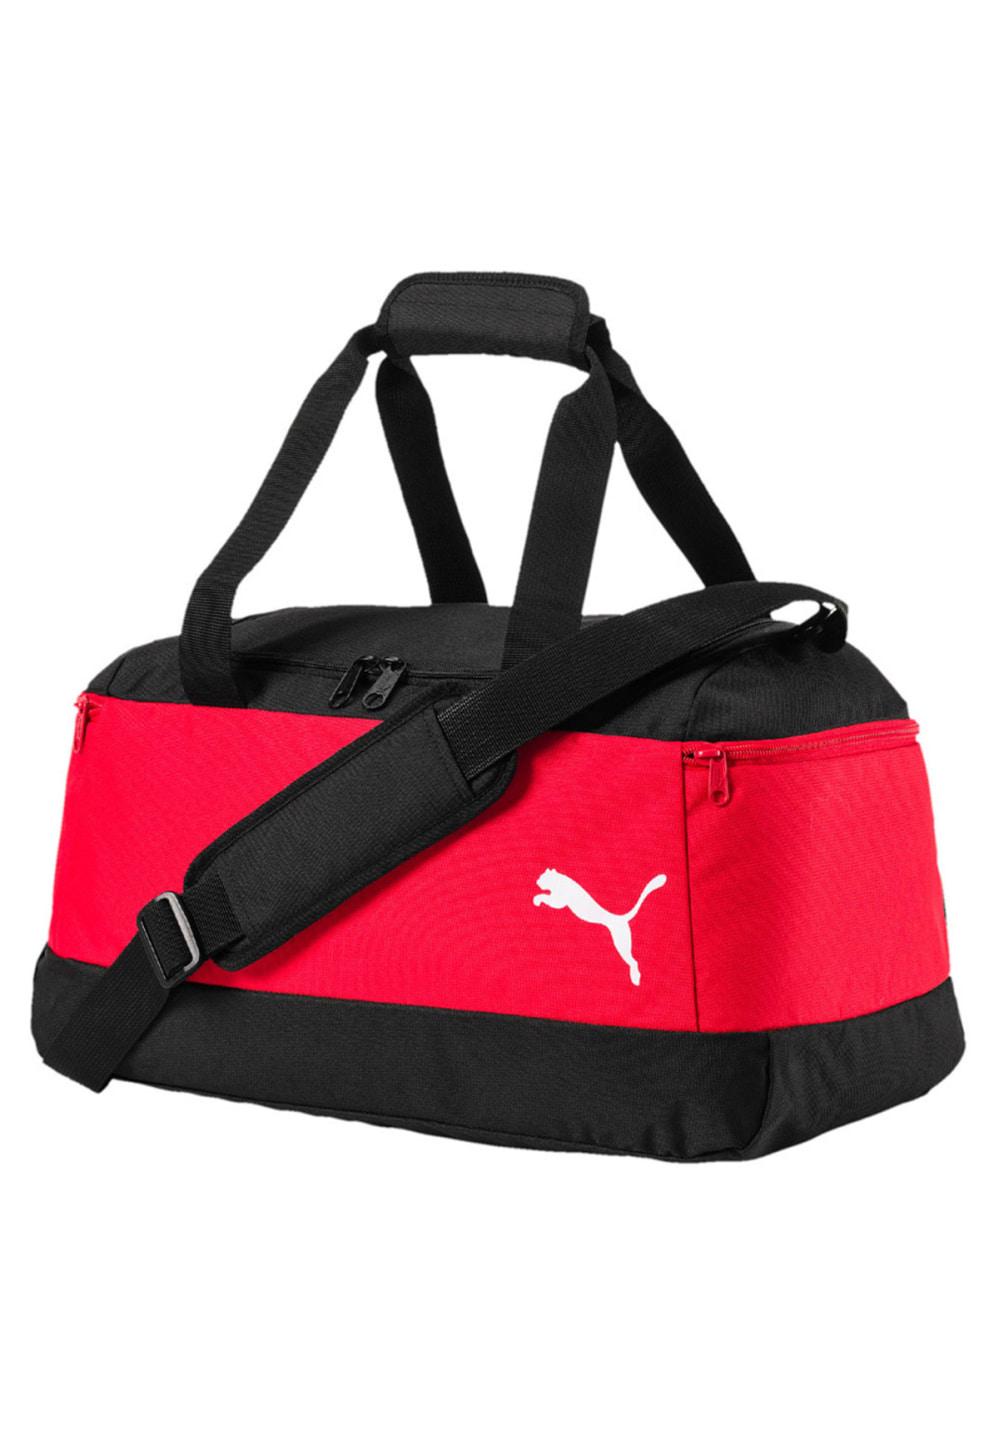 Puma Pro Training II Small Bag Sporttaschen - Schwarz